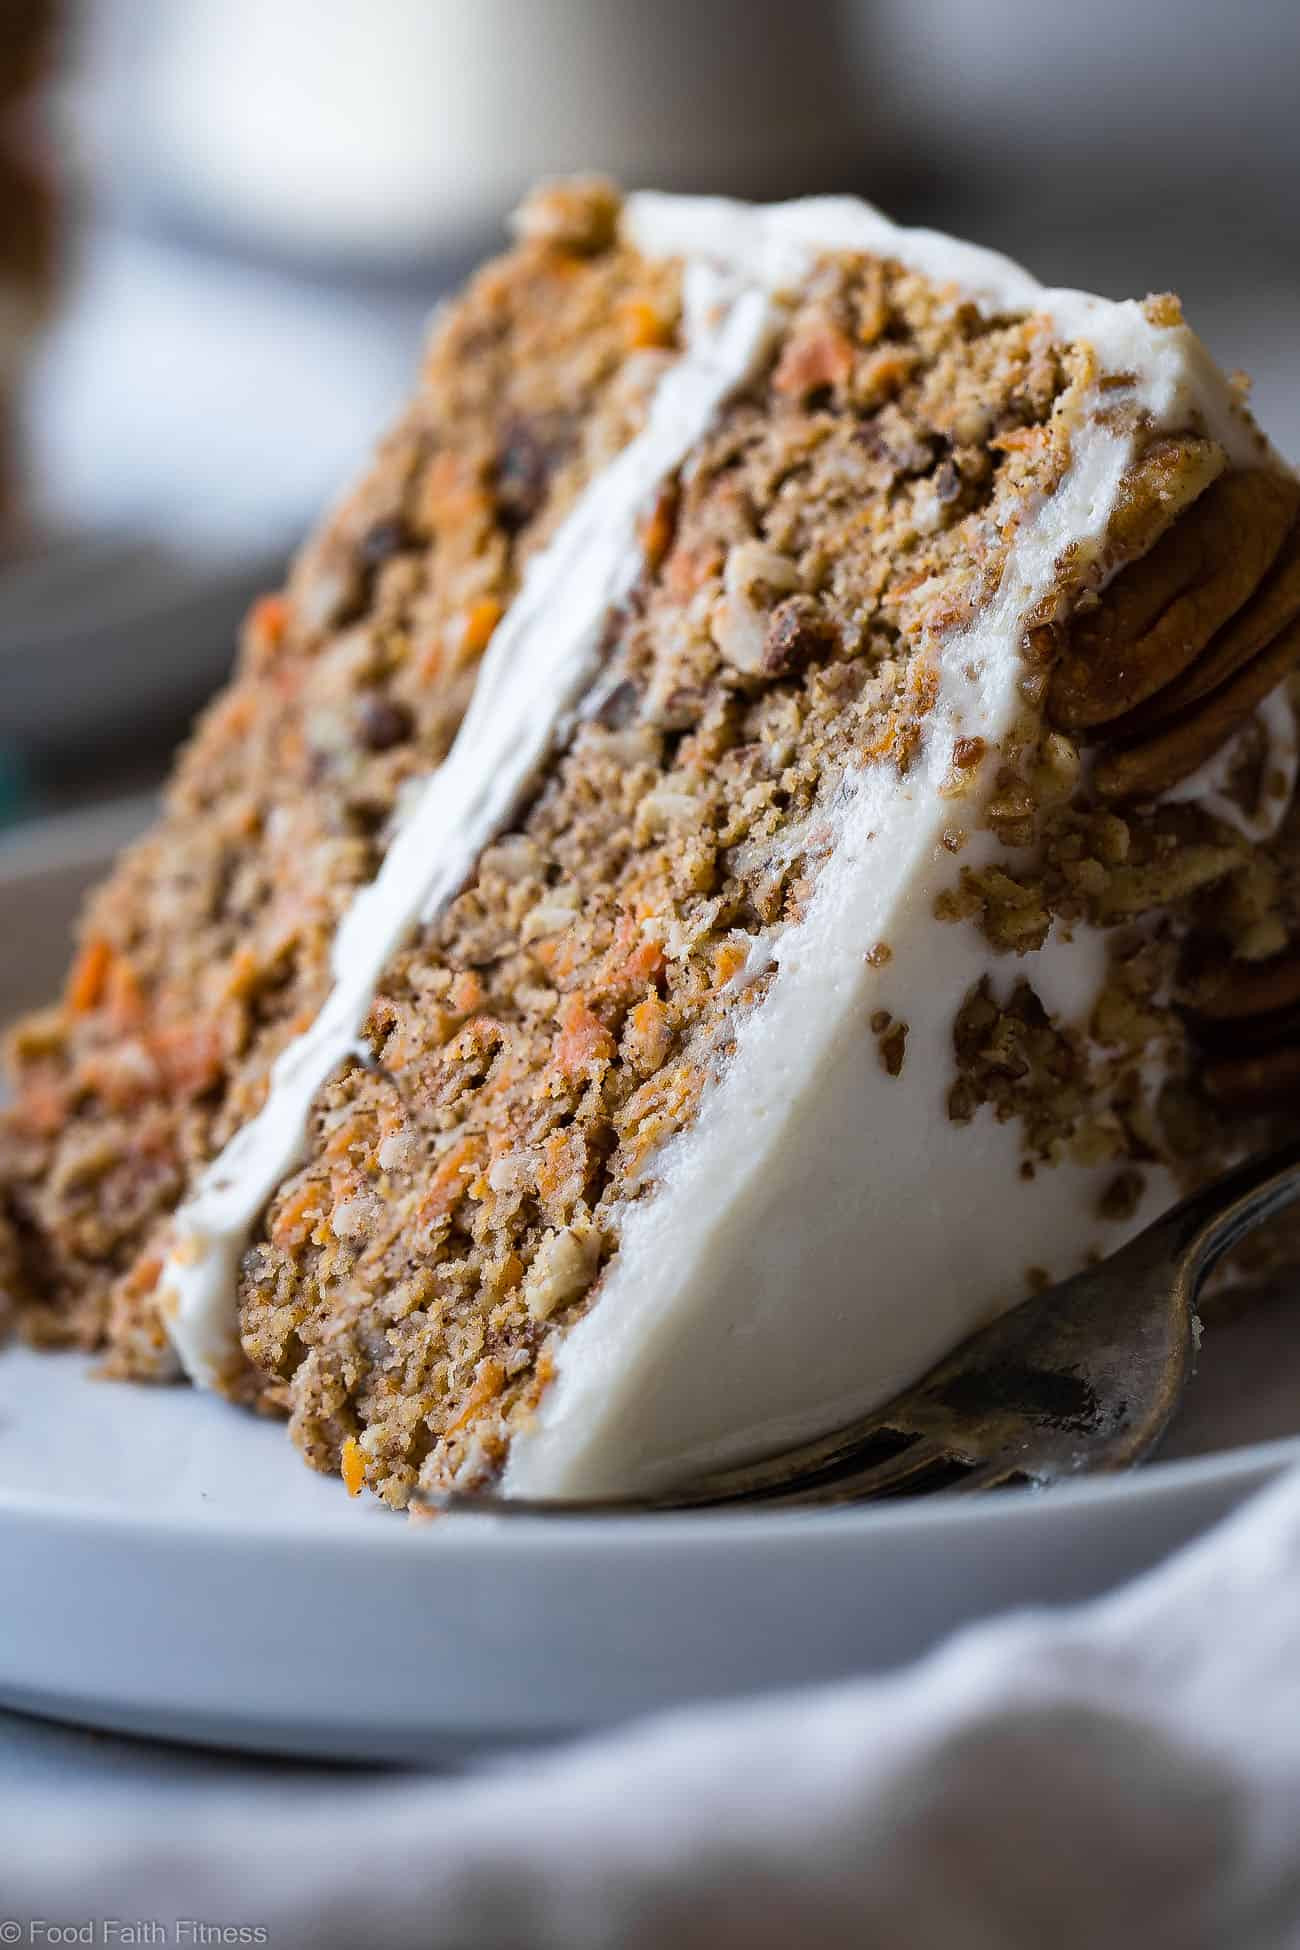 Gluten Free Sugar Free Carrot Cake  Healthy Gluten Free Sugar Free Carrot Cake